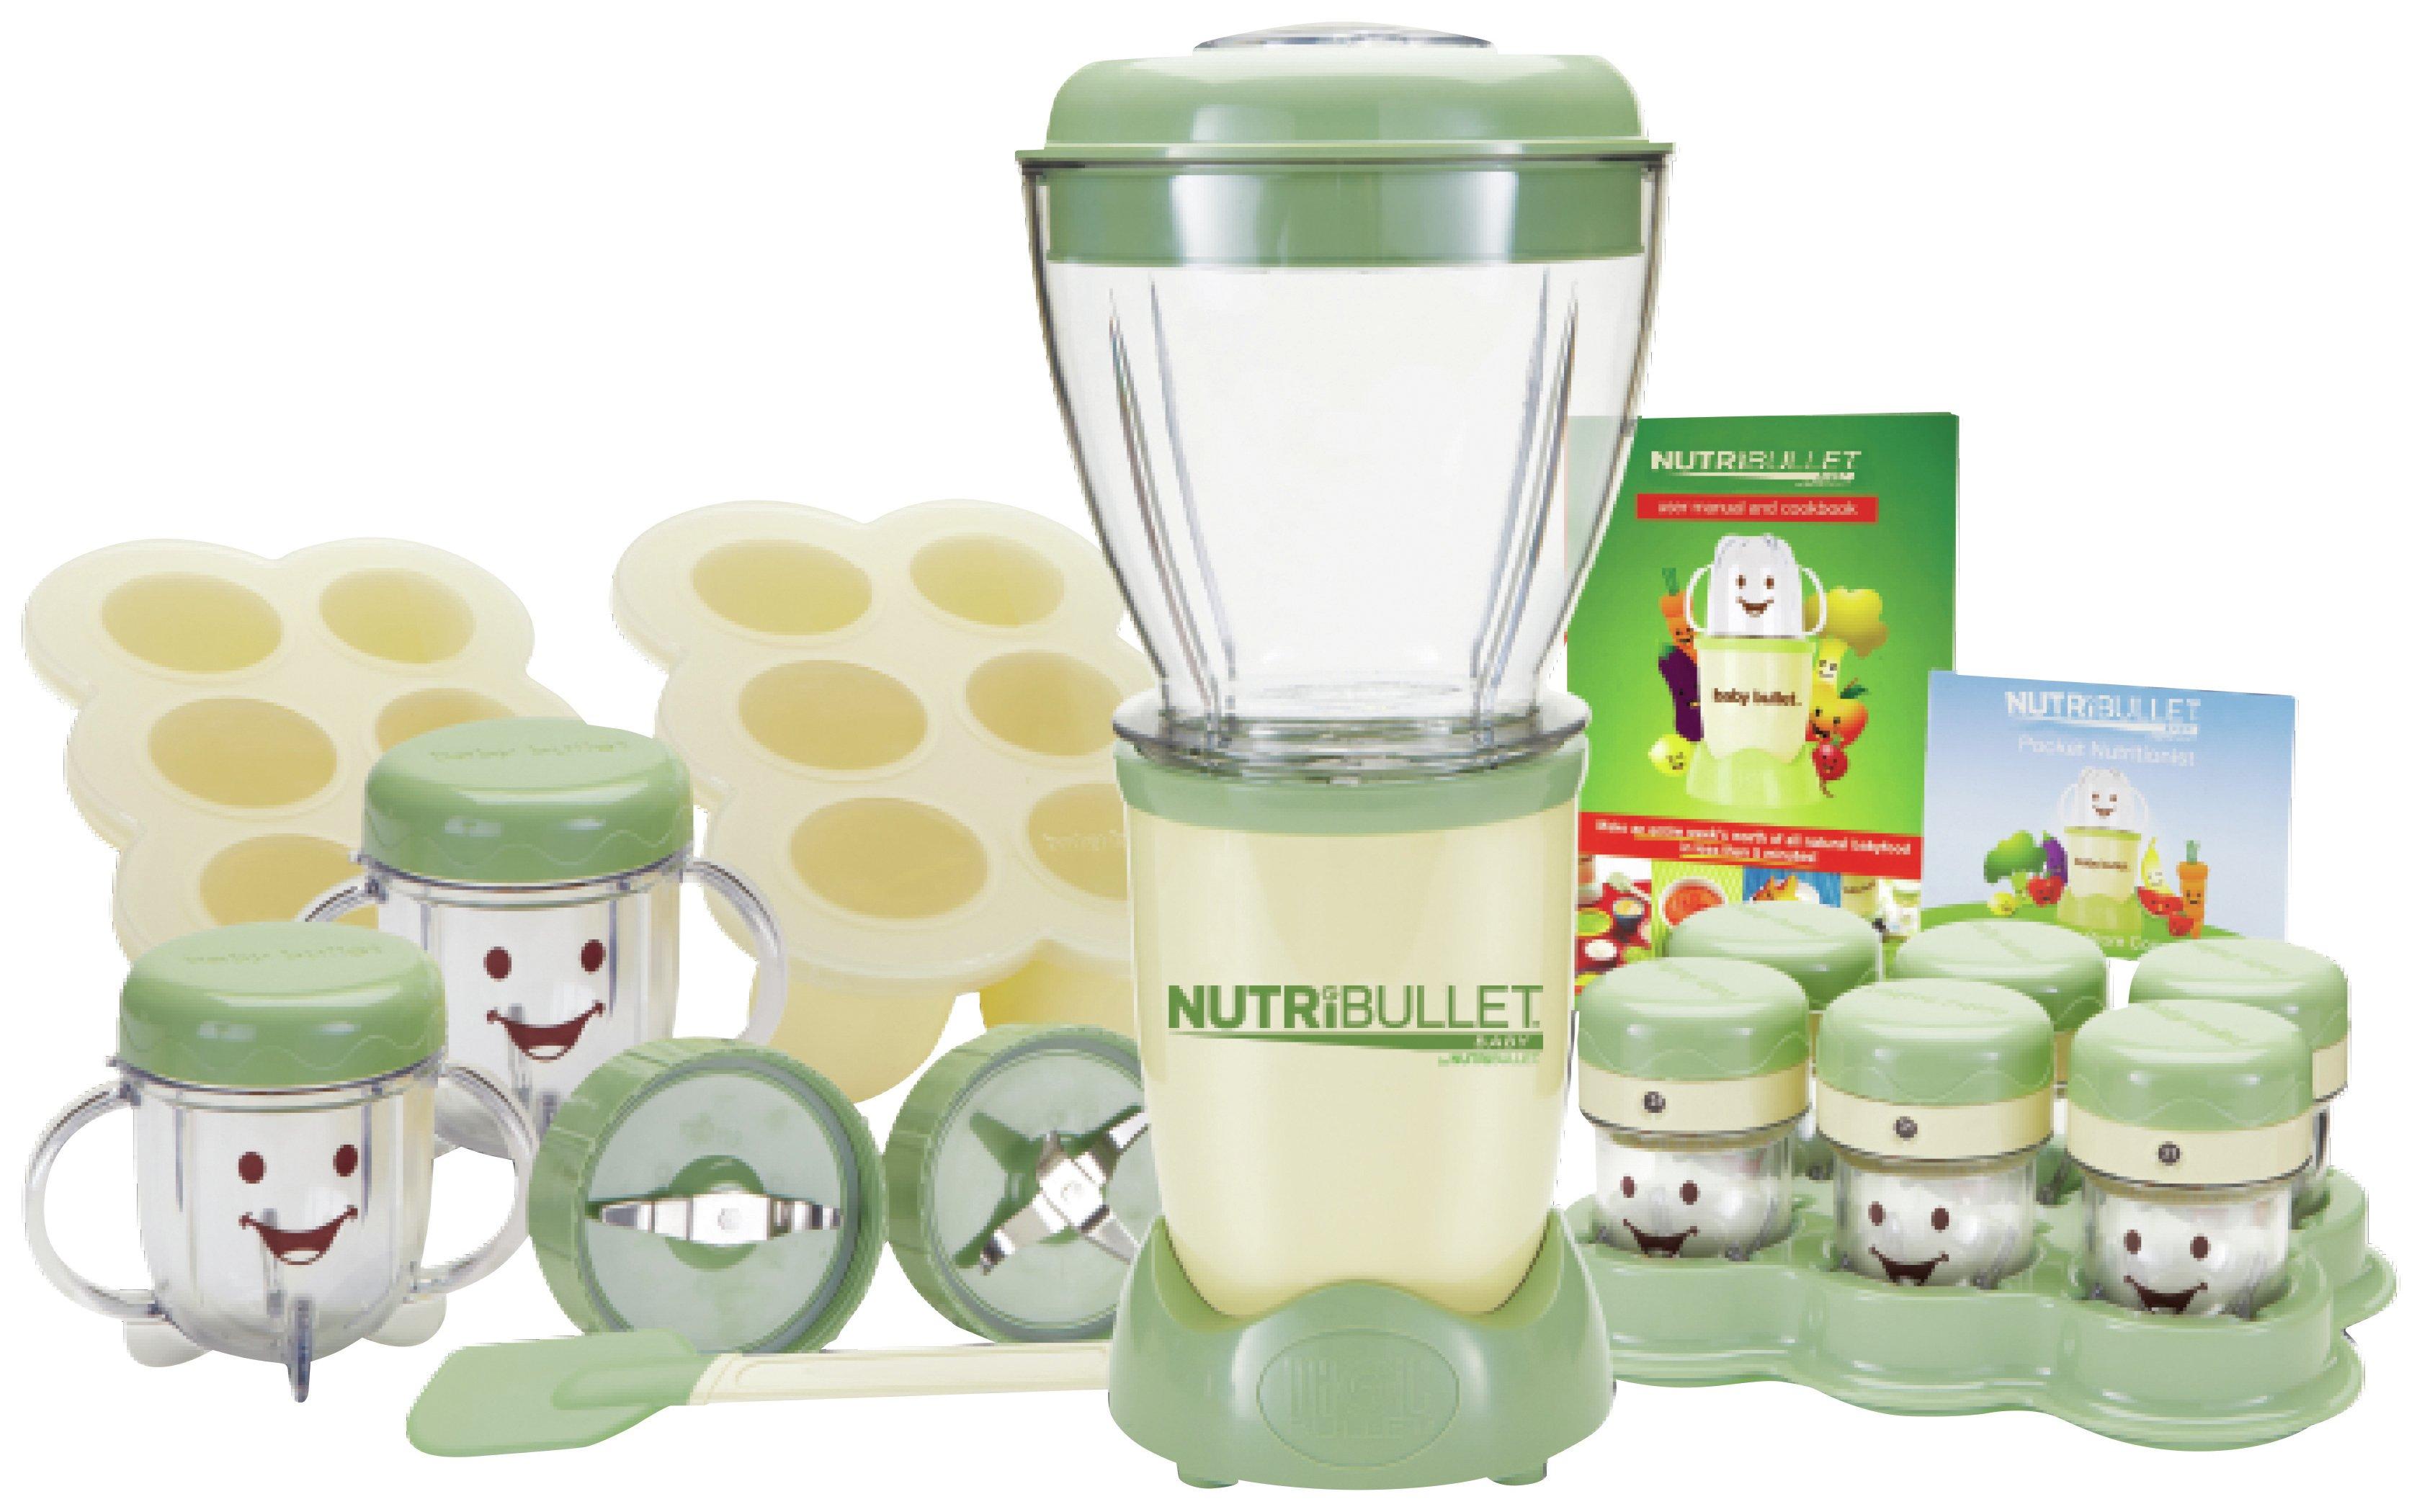 'Nutribullet - Baby Food Processor